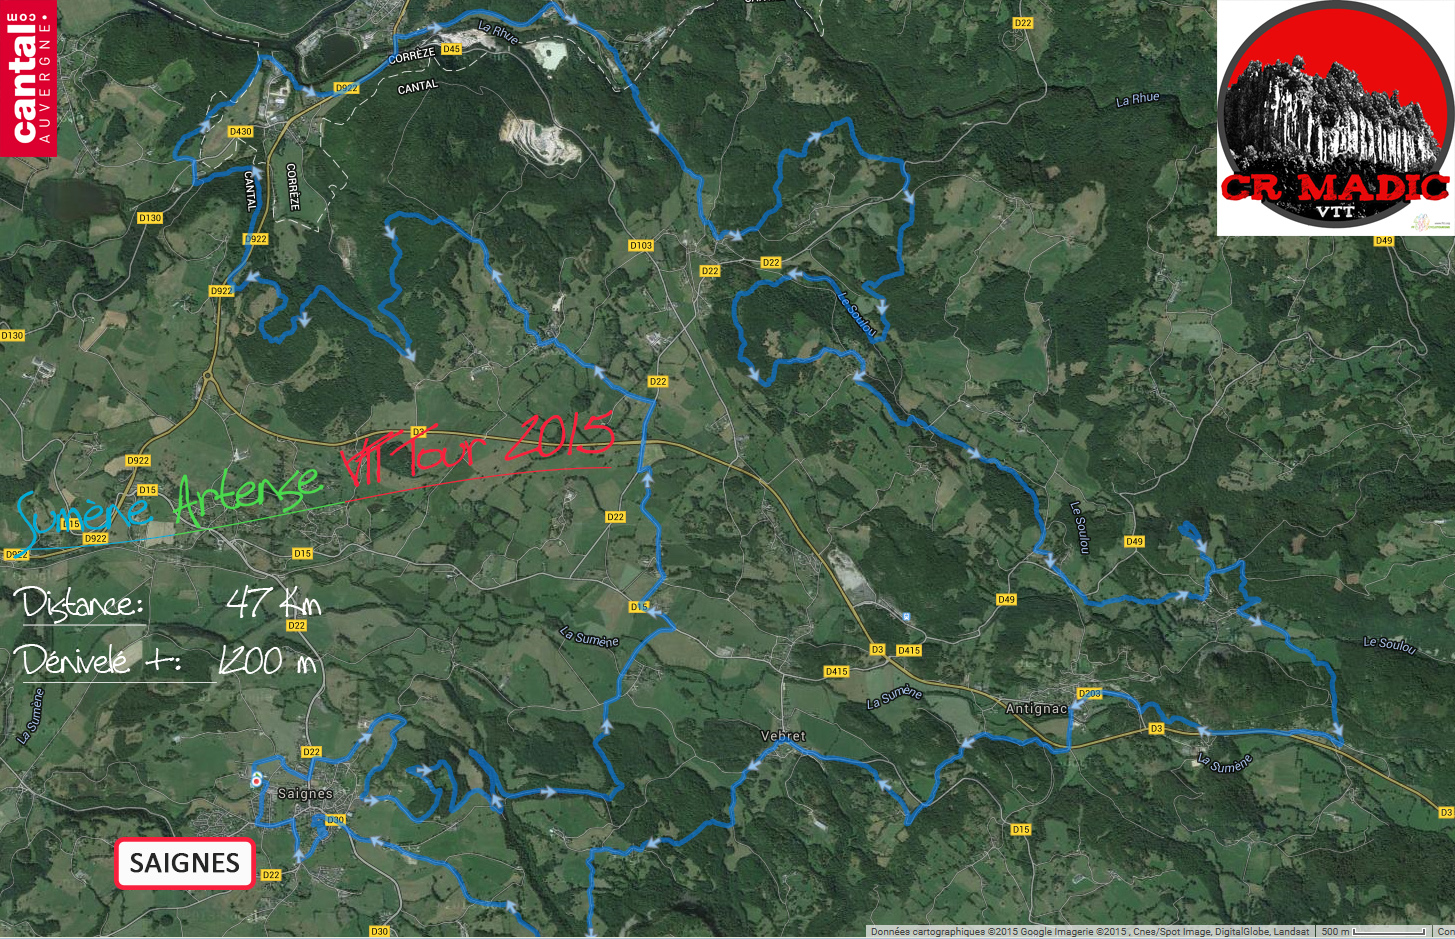 2015 savtt tour 47 km distance